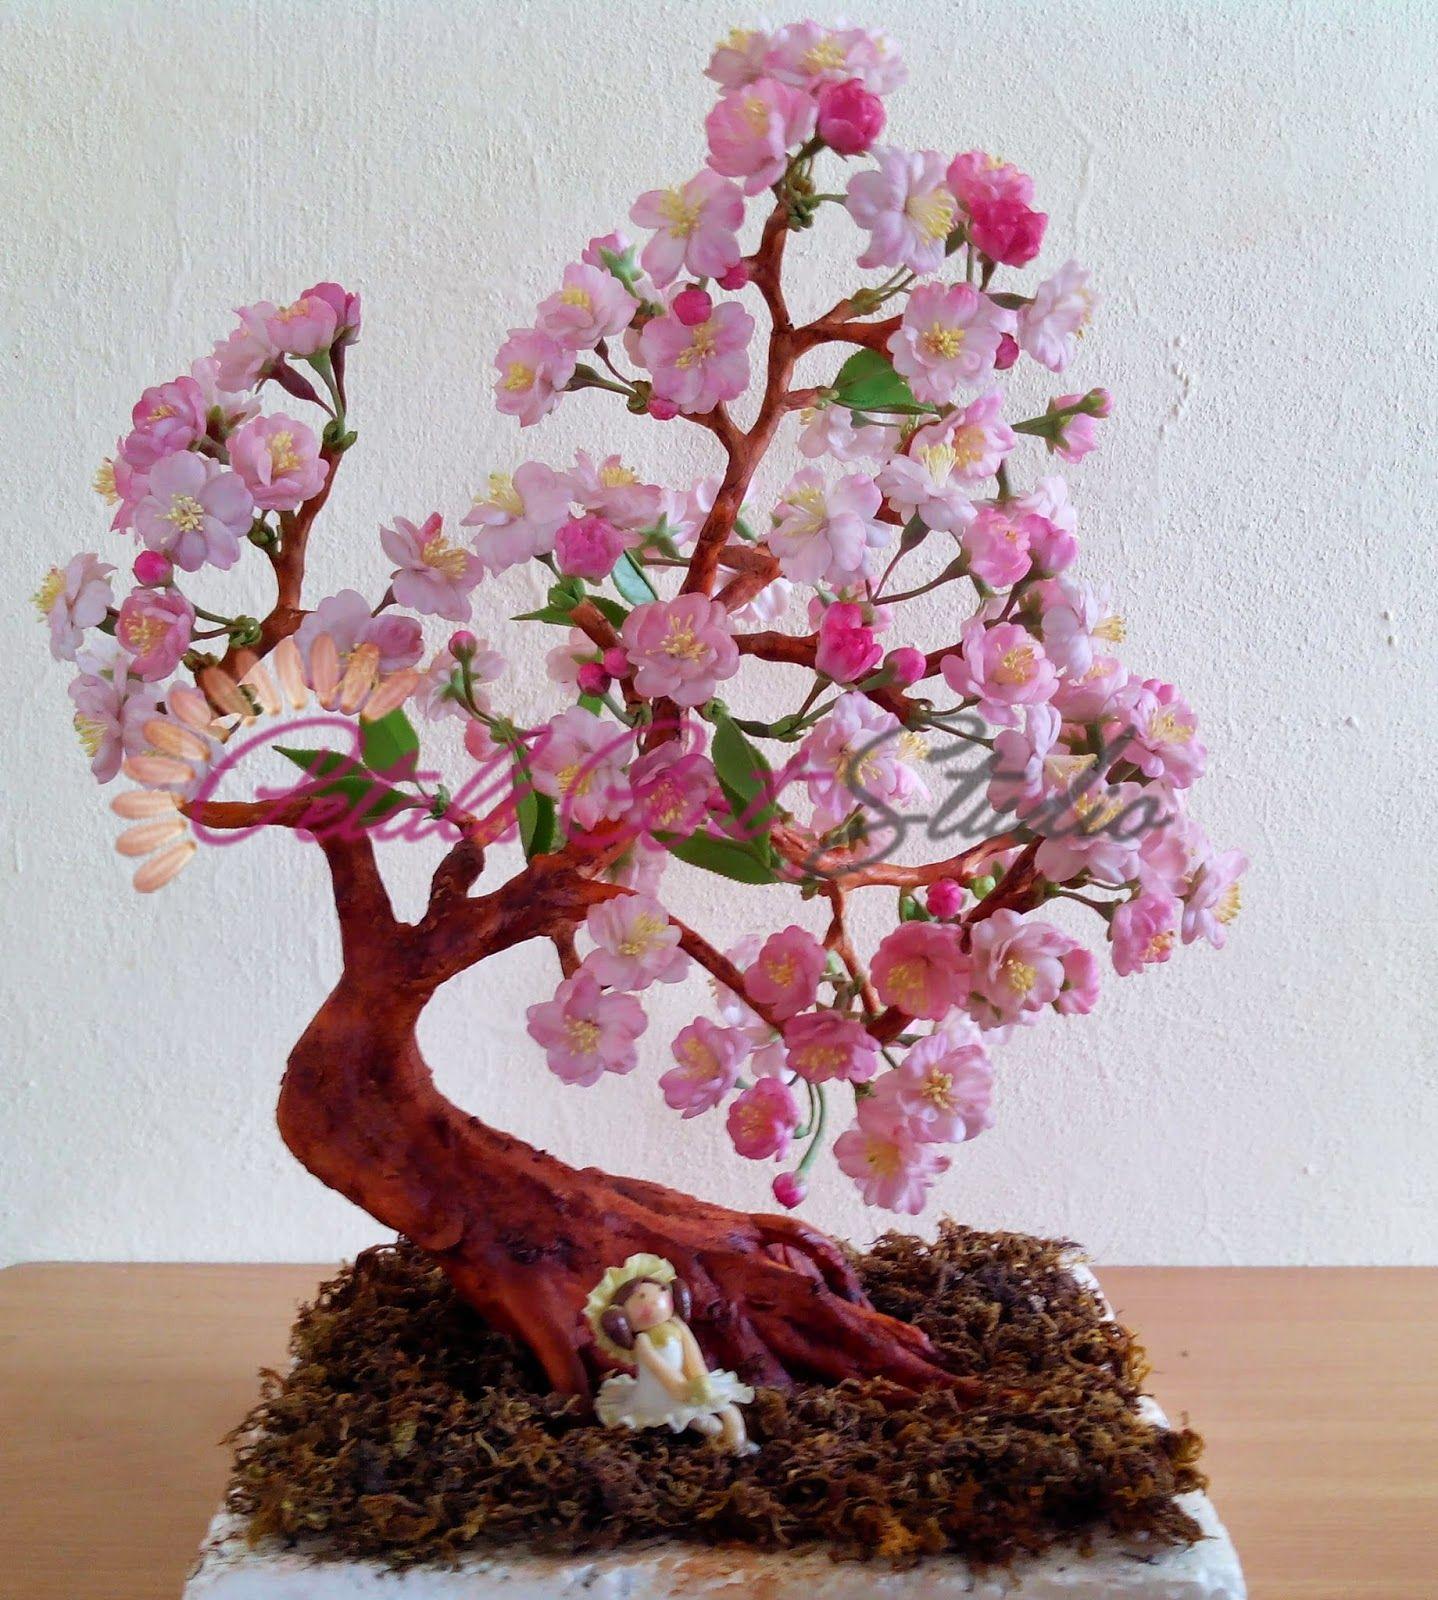 Image Result For Bonsai Tree Clay Bonsai Tree Bonsai Decor